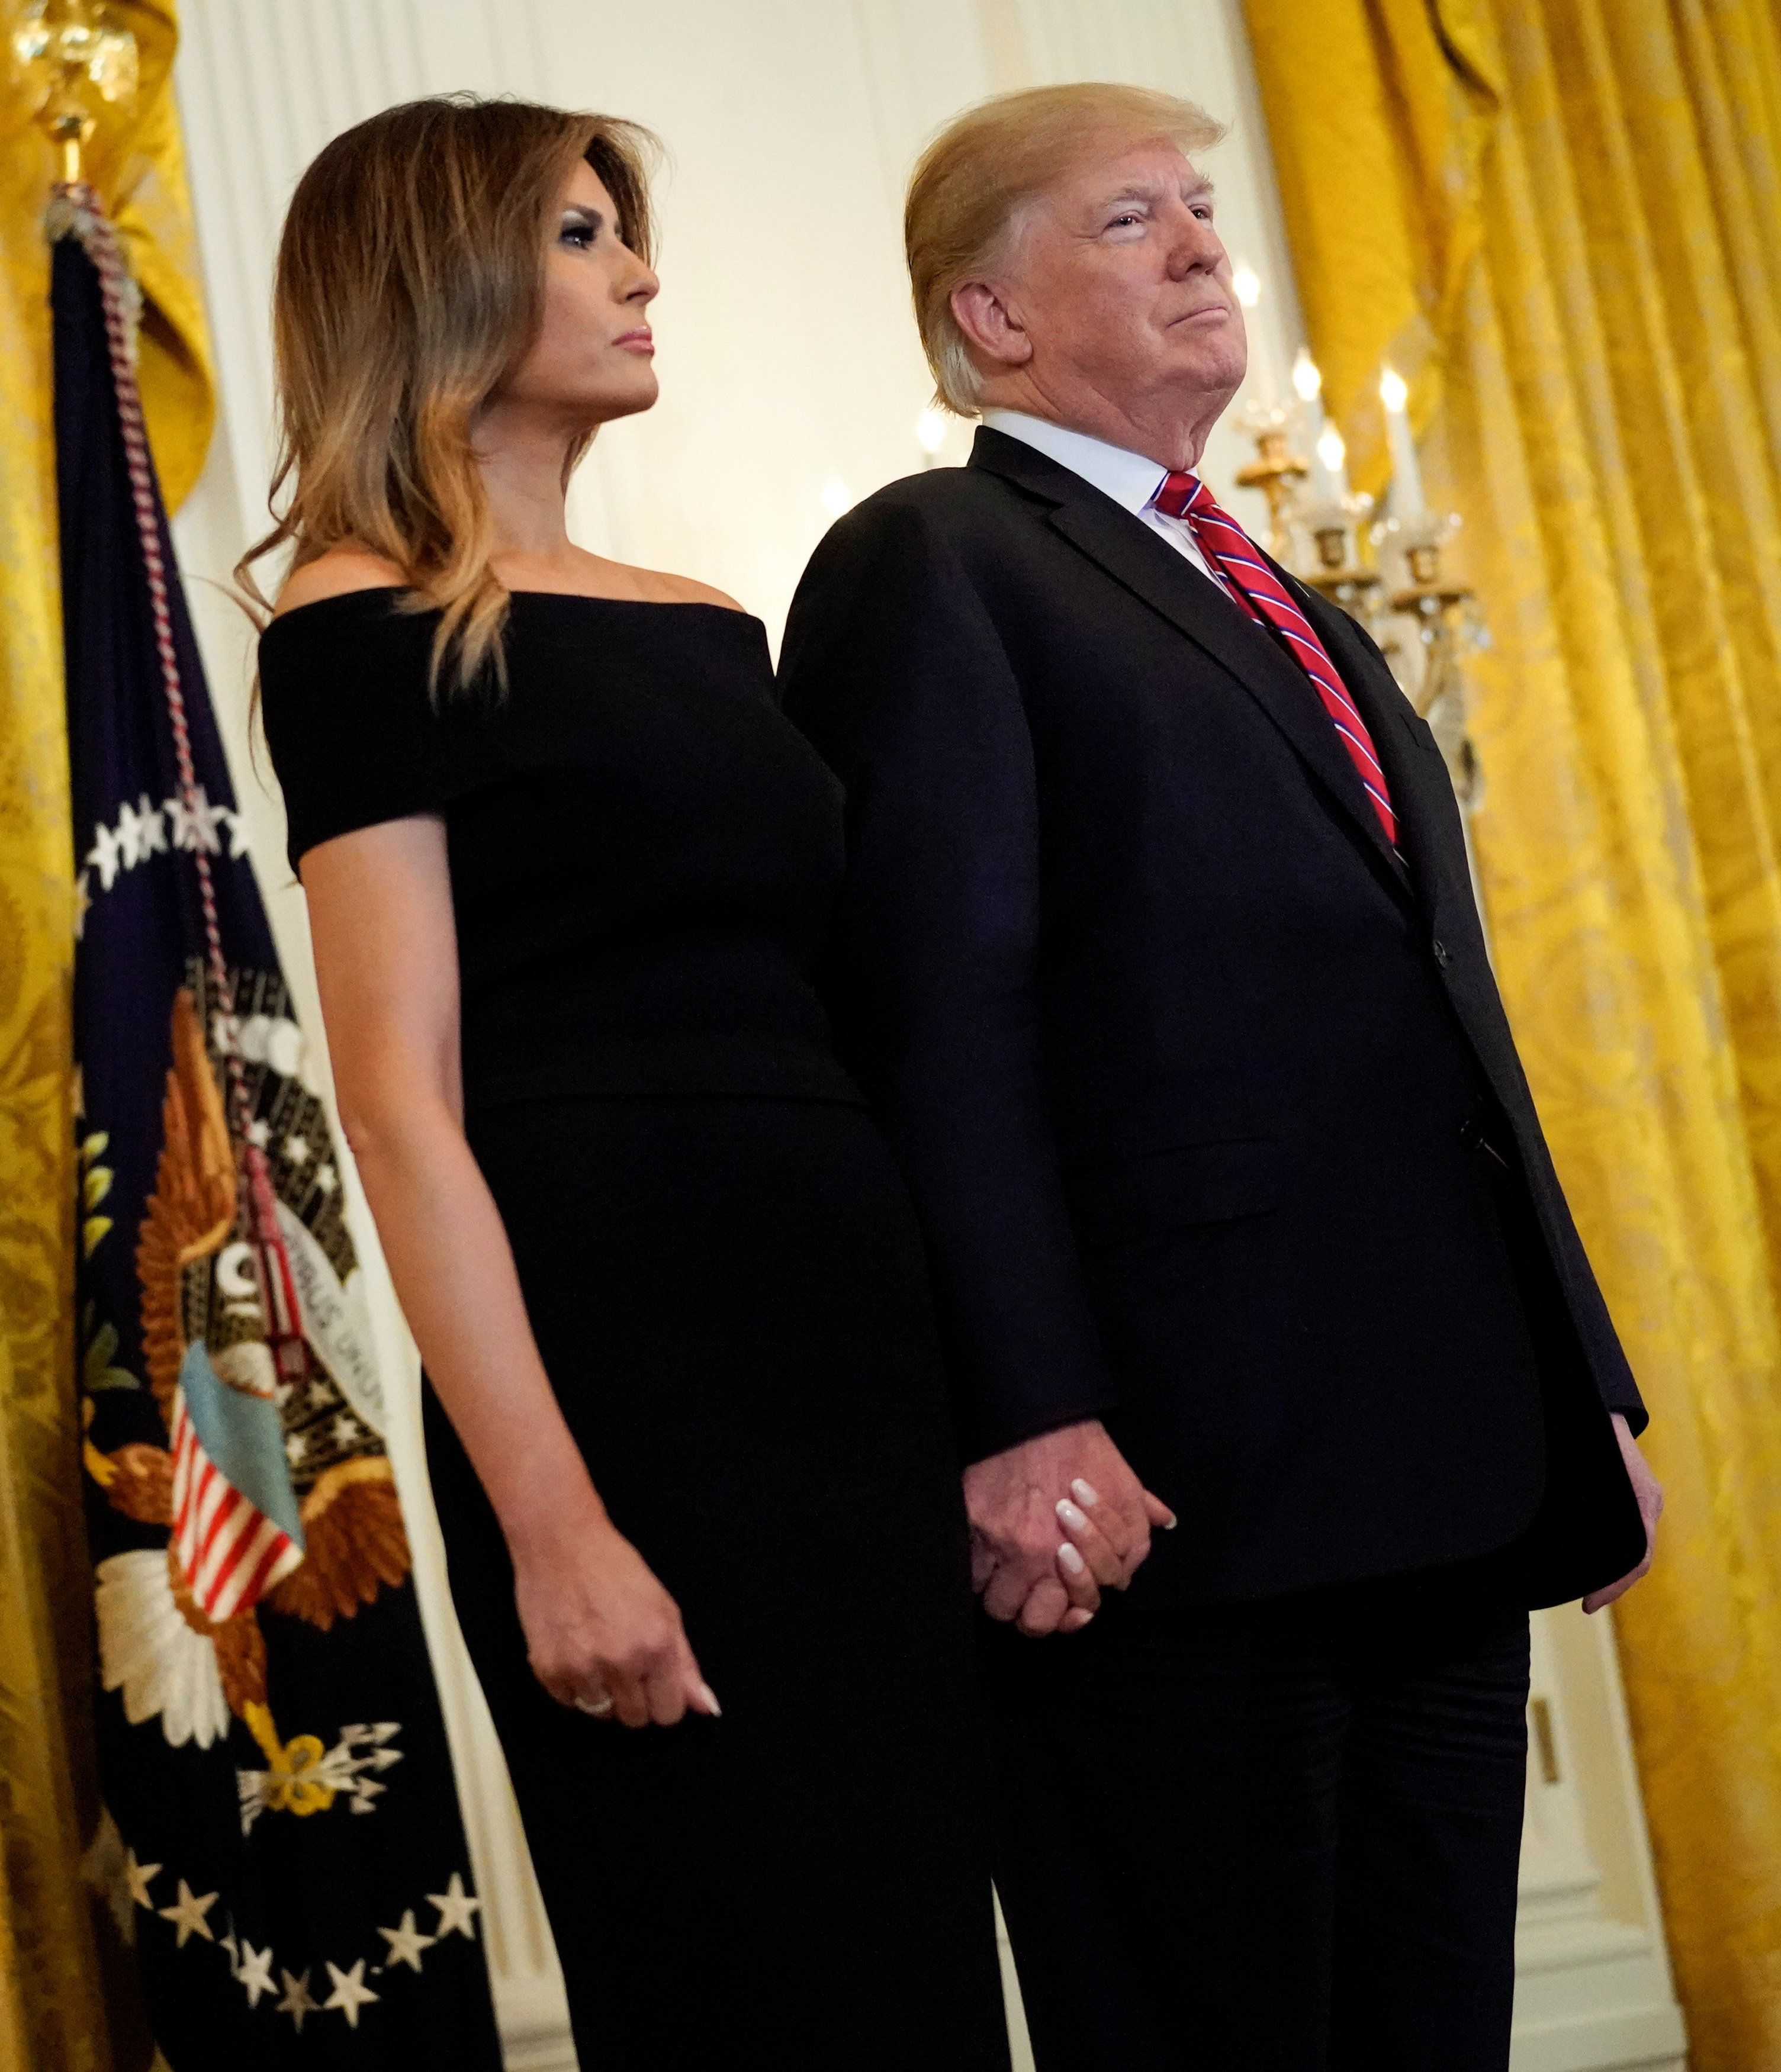 Melania Trump Calls Journalists 'Opportunists' Piggybacking on Husband's